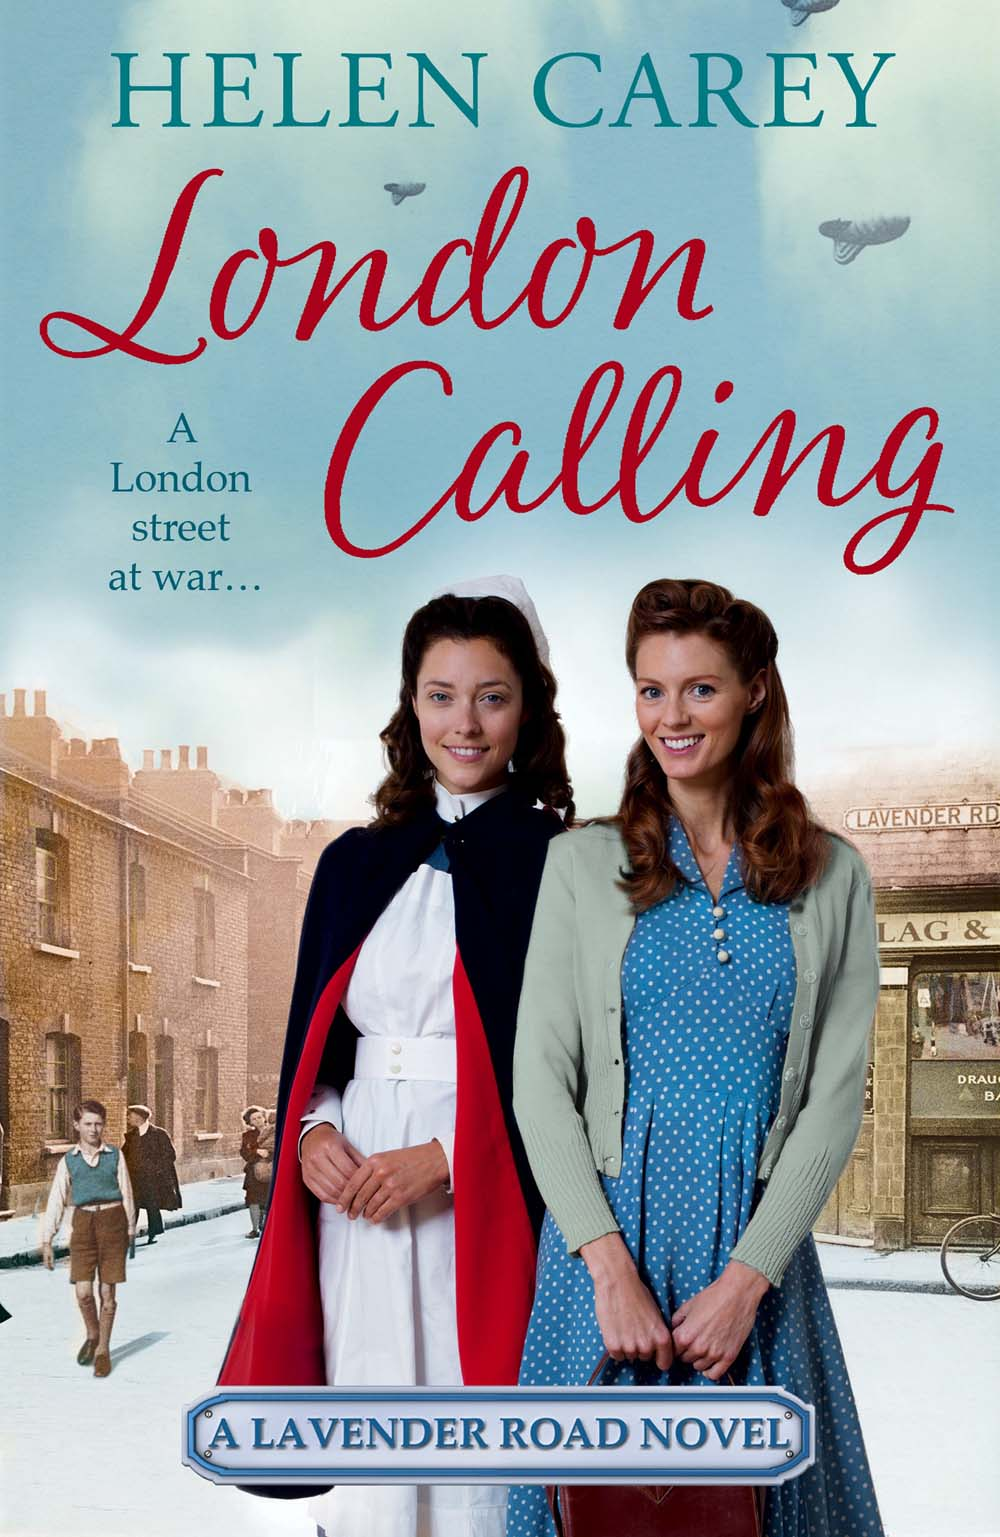 London Calling is Helen Carey's Fourth  Lavender Road  Novel